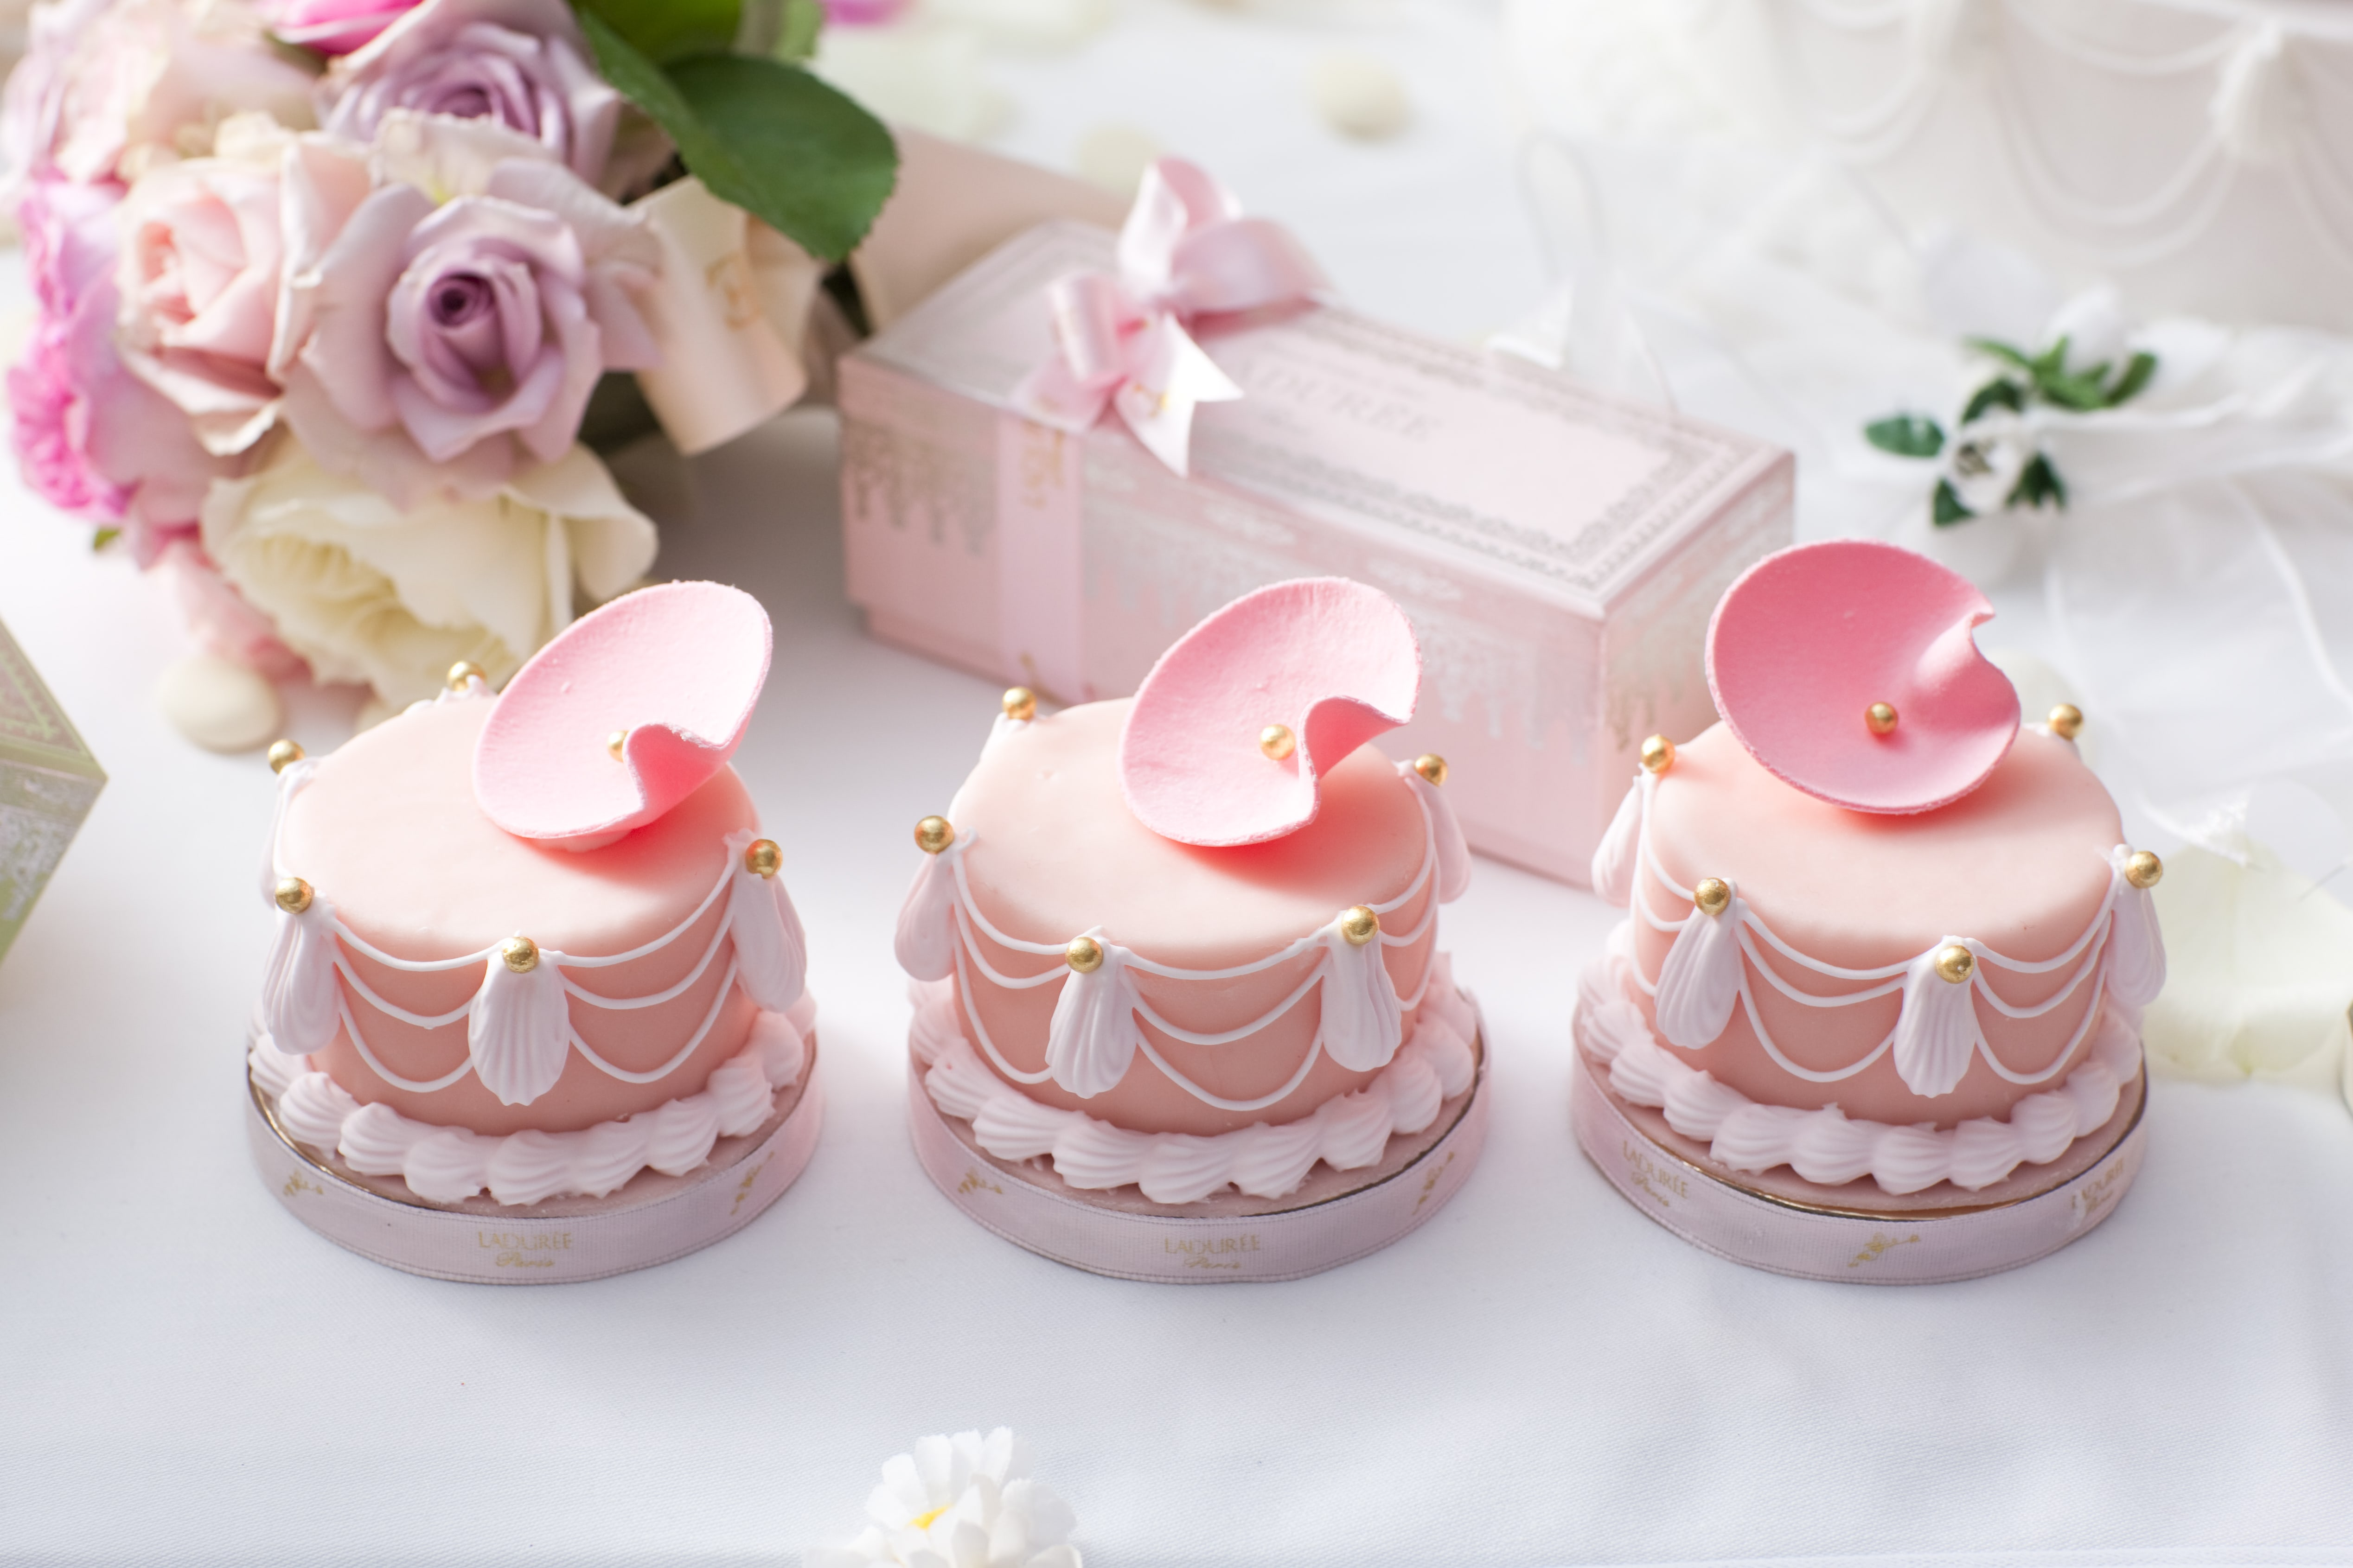 sobremesa-rosa-cha-de-panela-minibolo-02-min